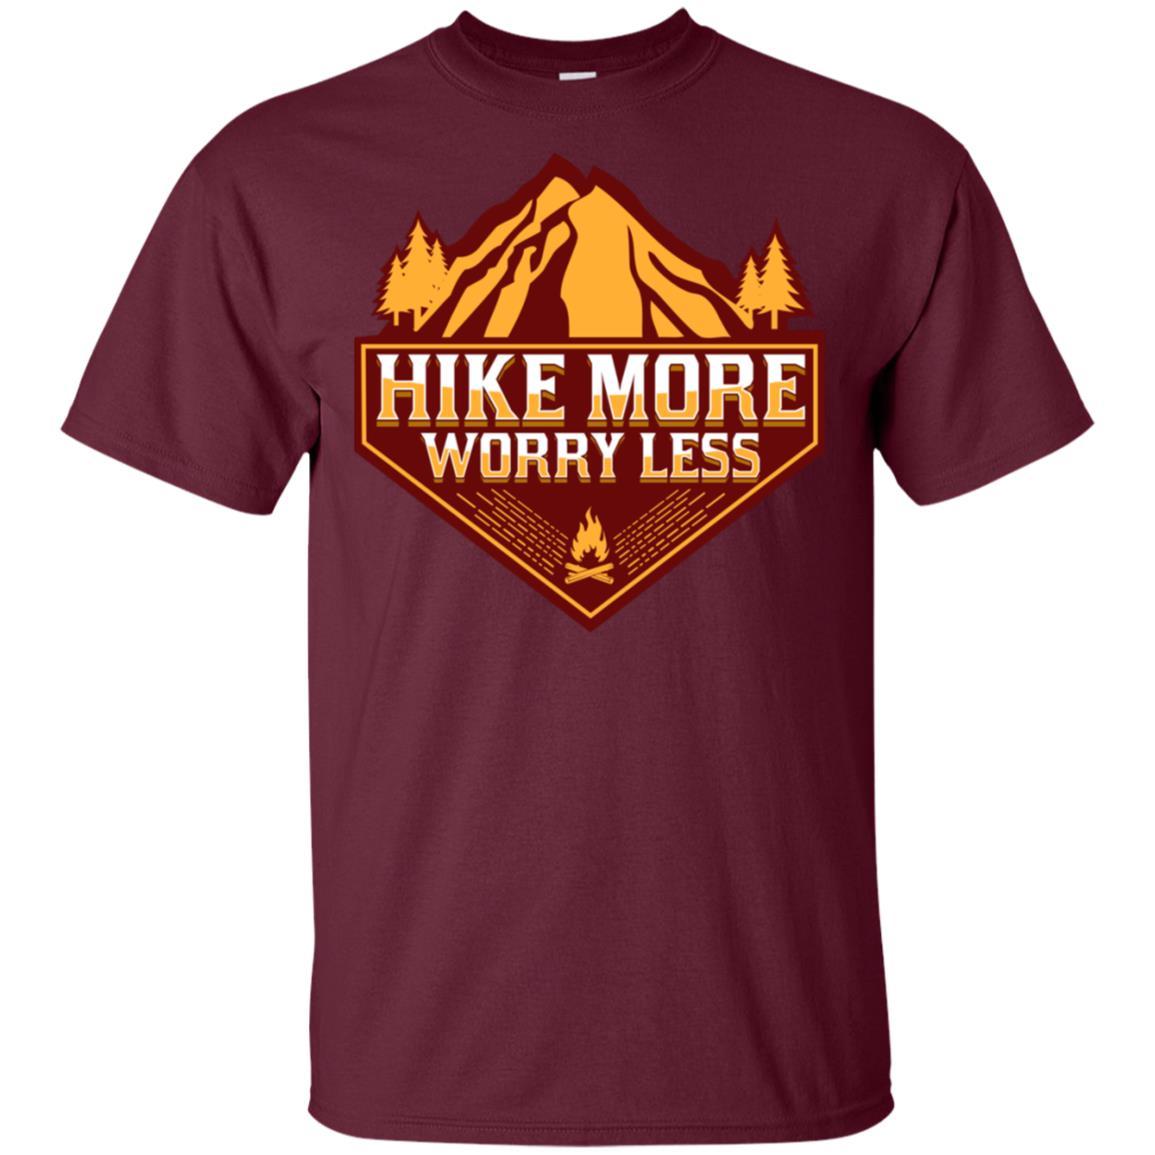 Hike More Worry Less Hiking Camp Gift Unisex Short Sleeve